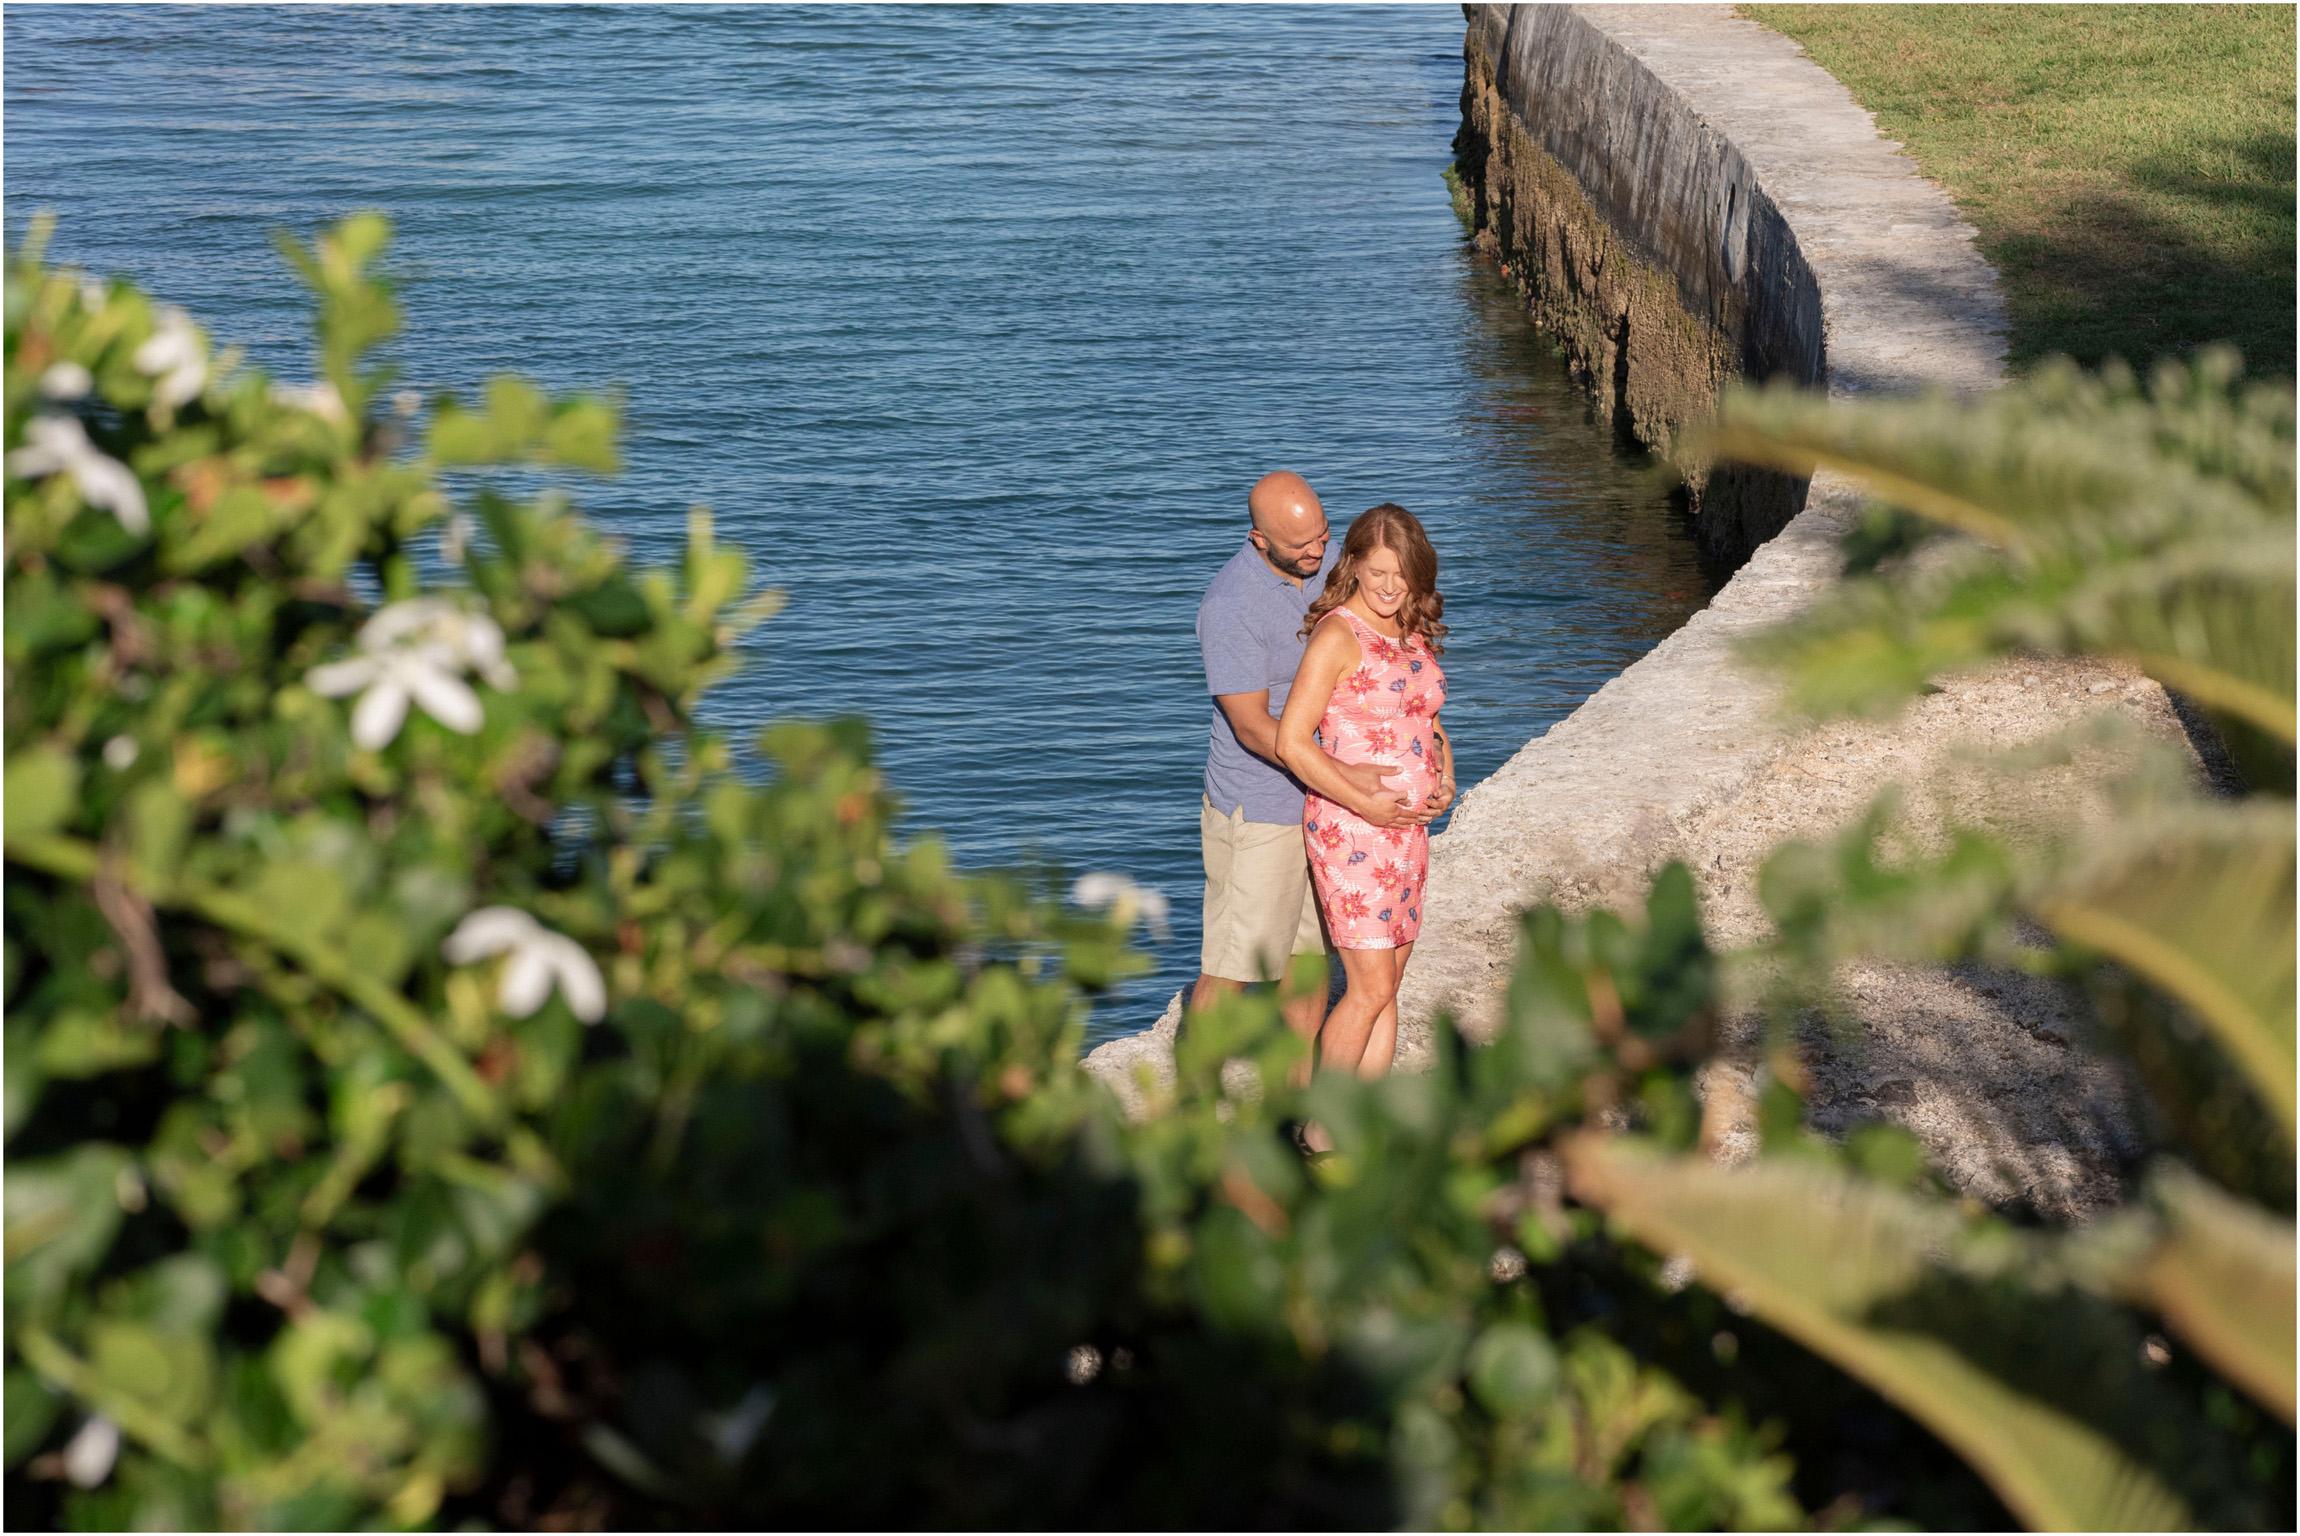 ©FianderFoto_Bermuda Maternity Photographer_Elys Harbour_Ft Scaur_Airbnb_Victoria_Mike_003.jpg